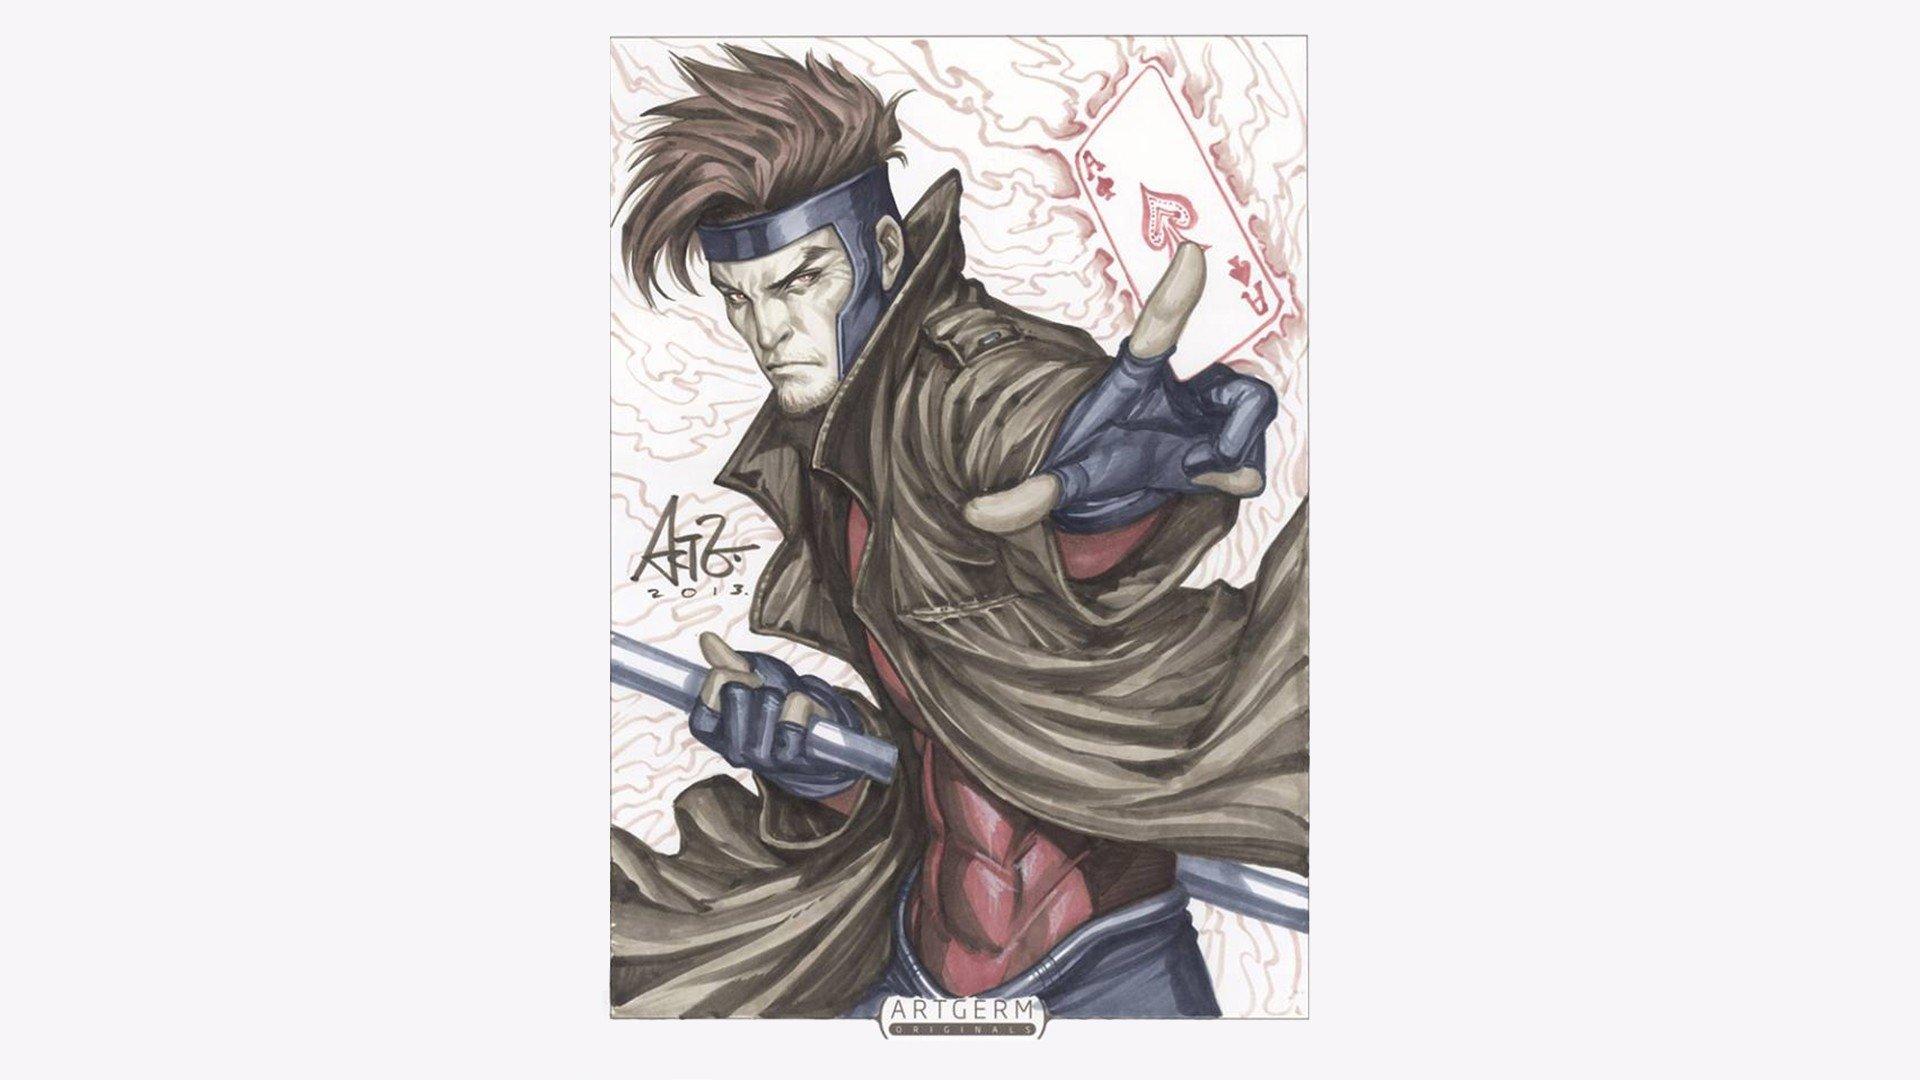 gambit guardians wallpaper 1920x1080 - photo #30